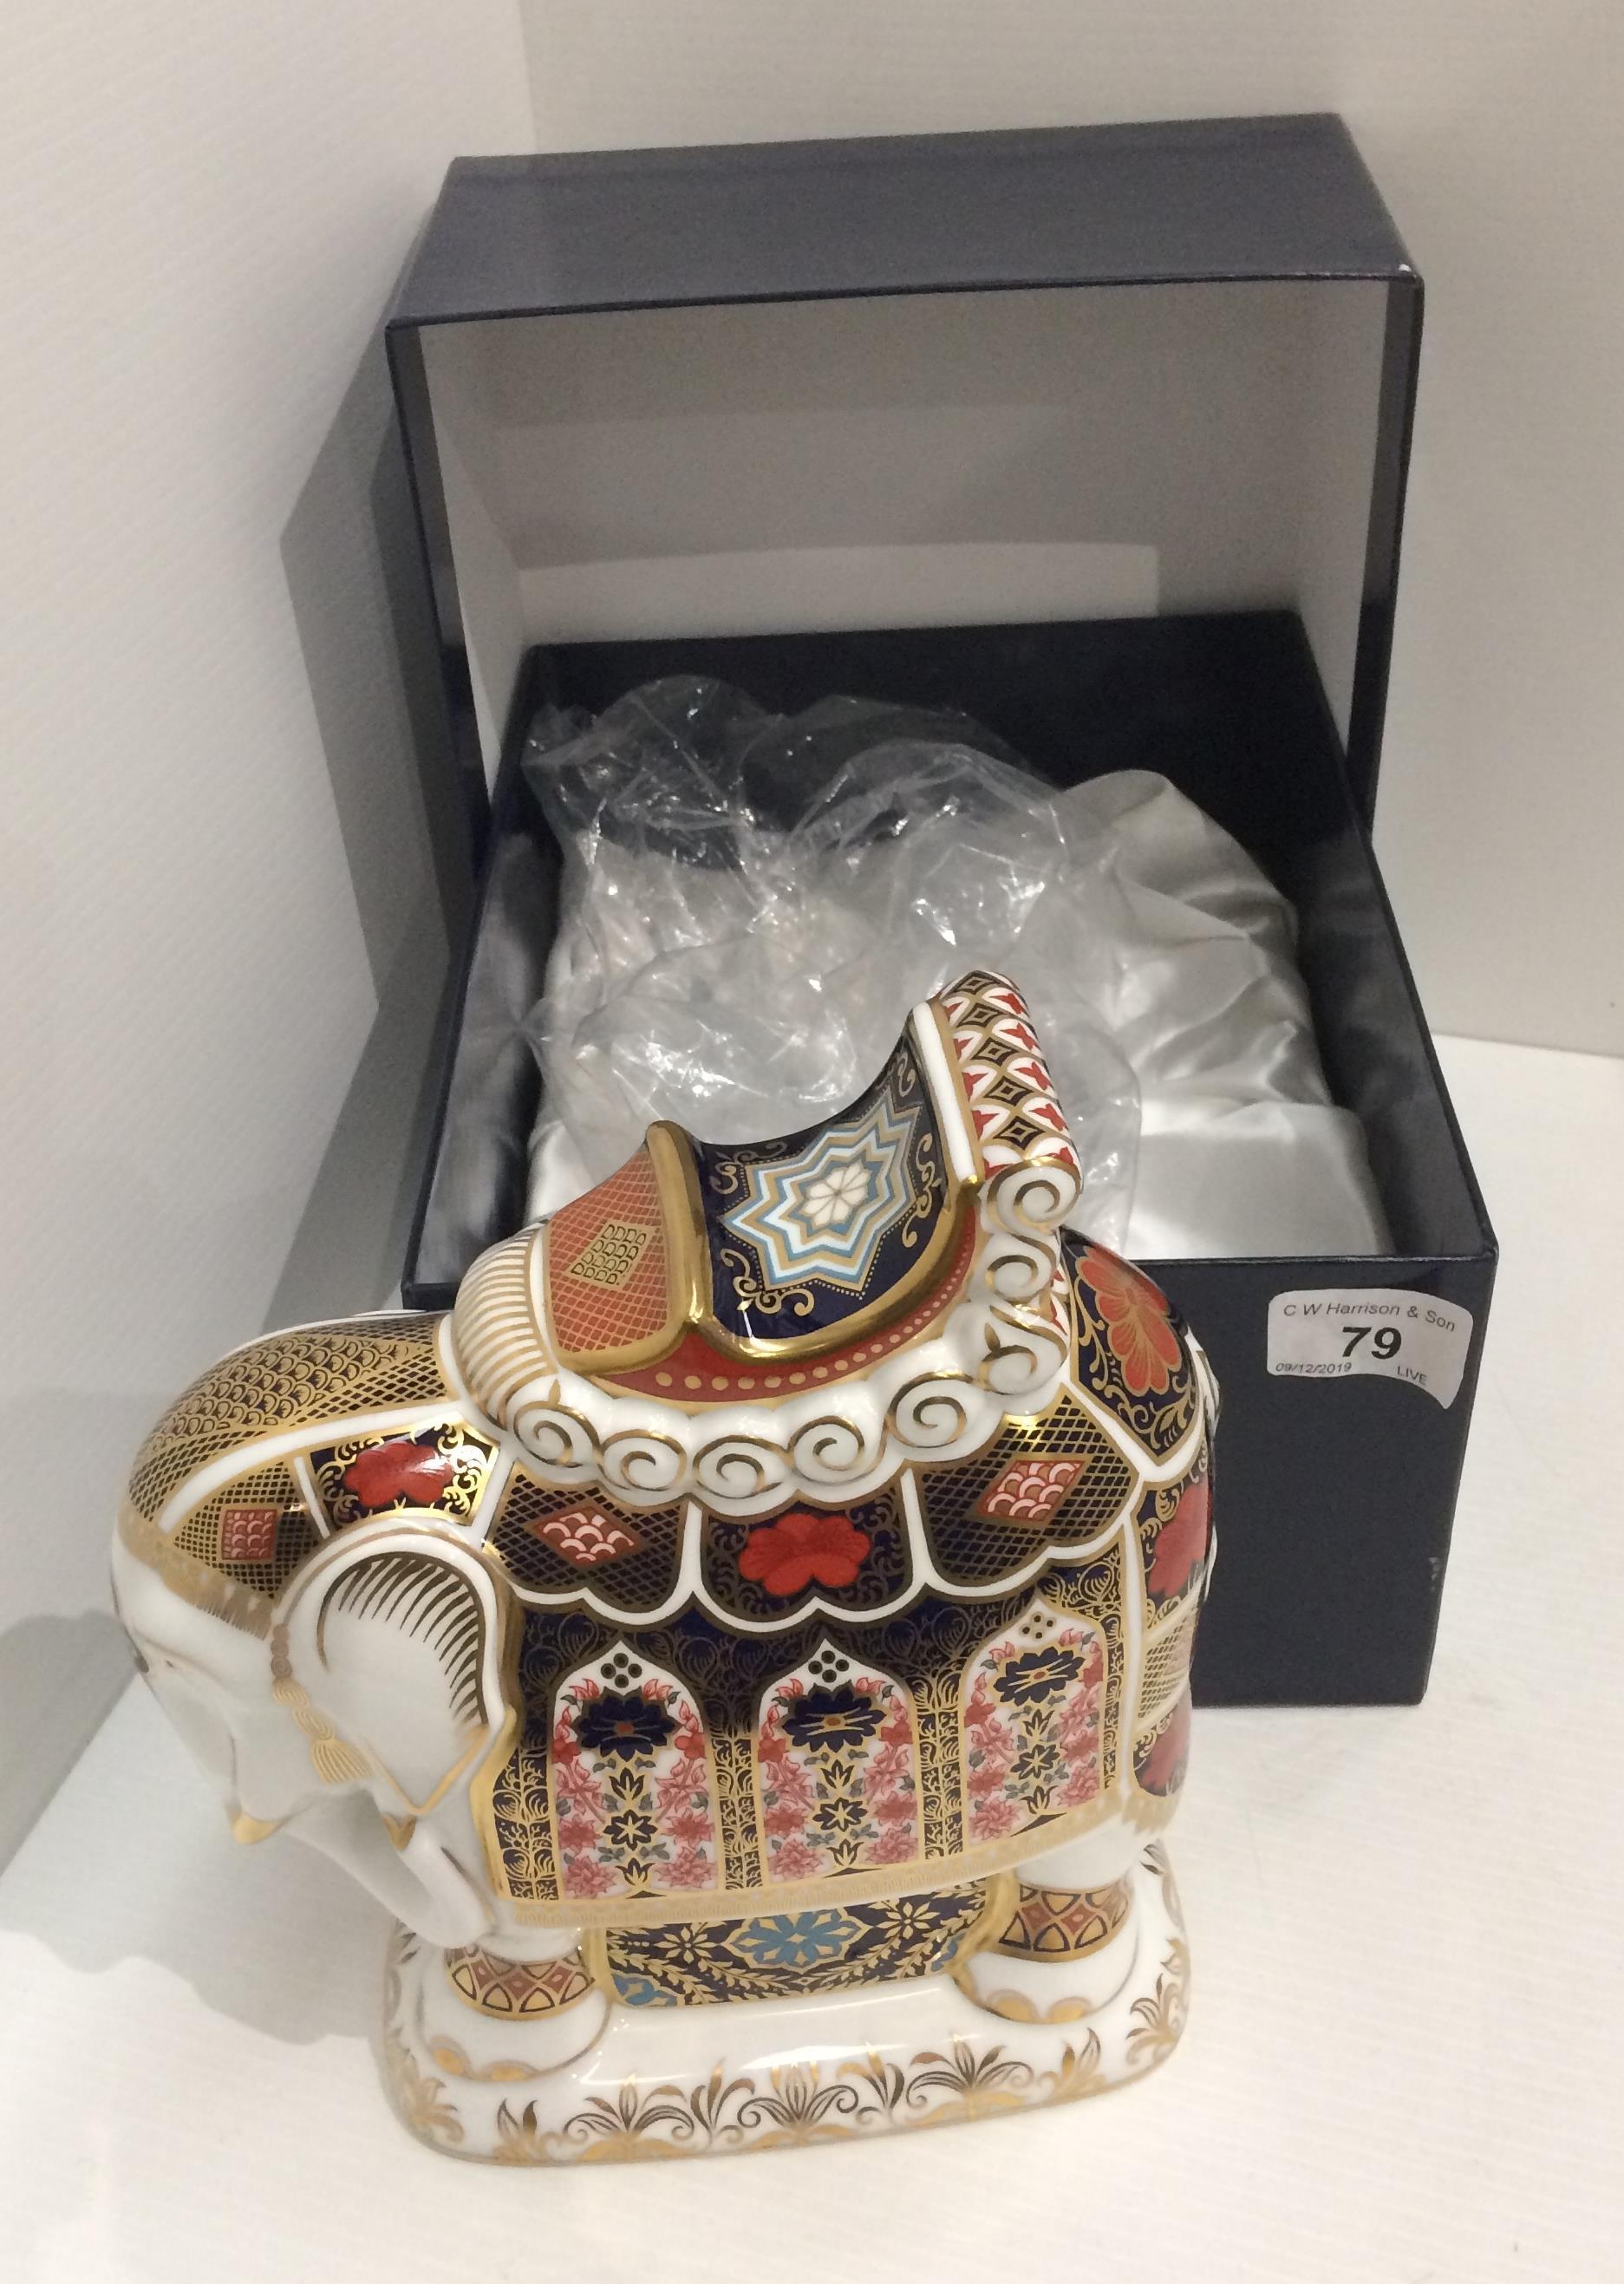 Lot 79 - A Royal Crown Derby bone china Indian Elephant - 18cm long x 21cm high,